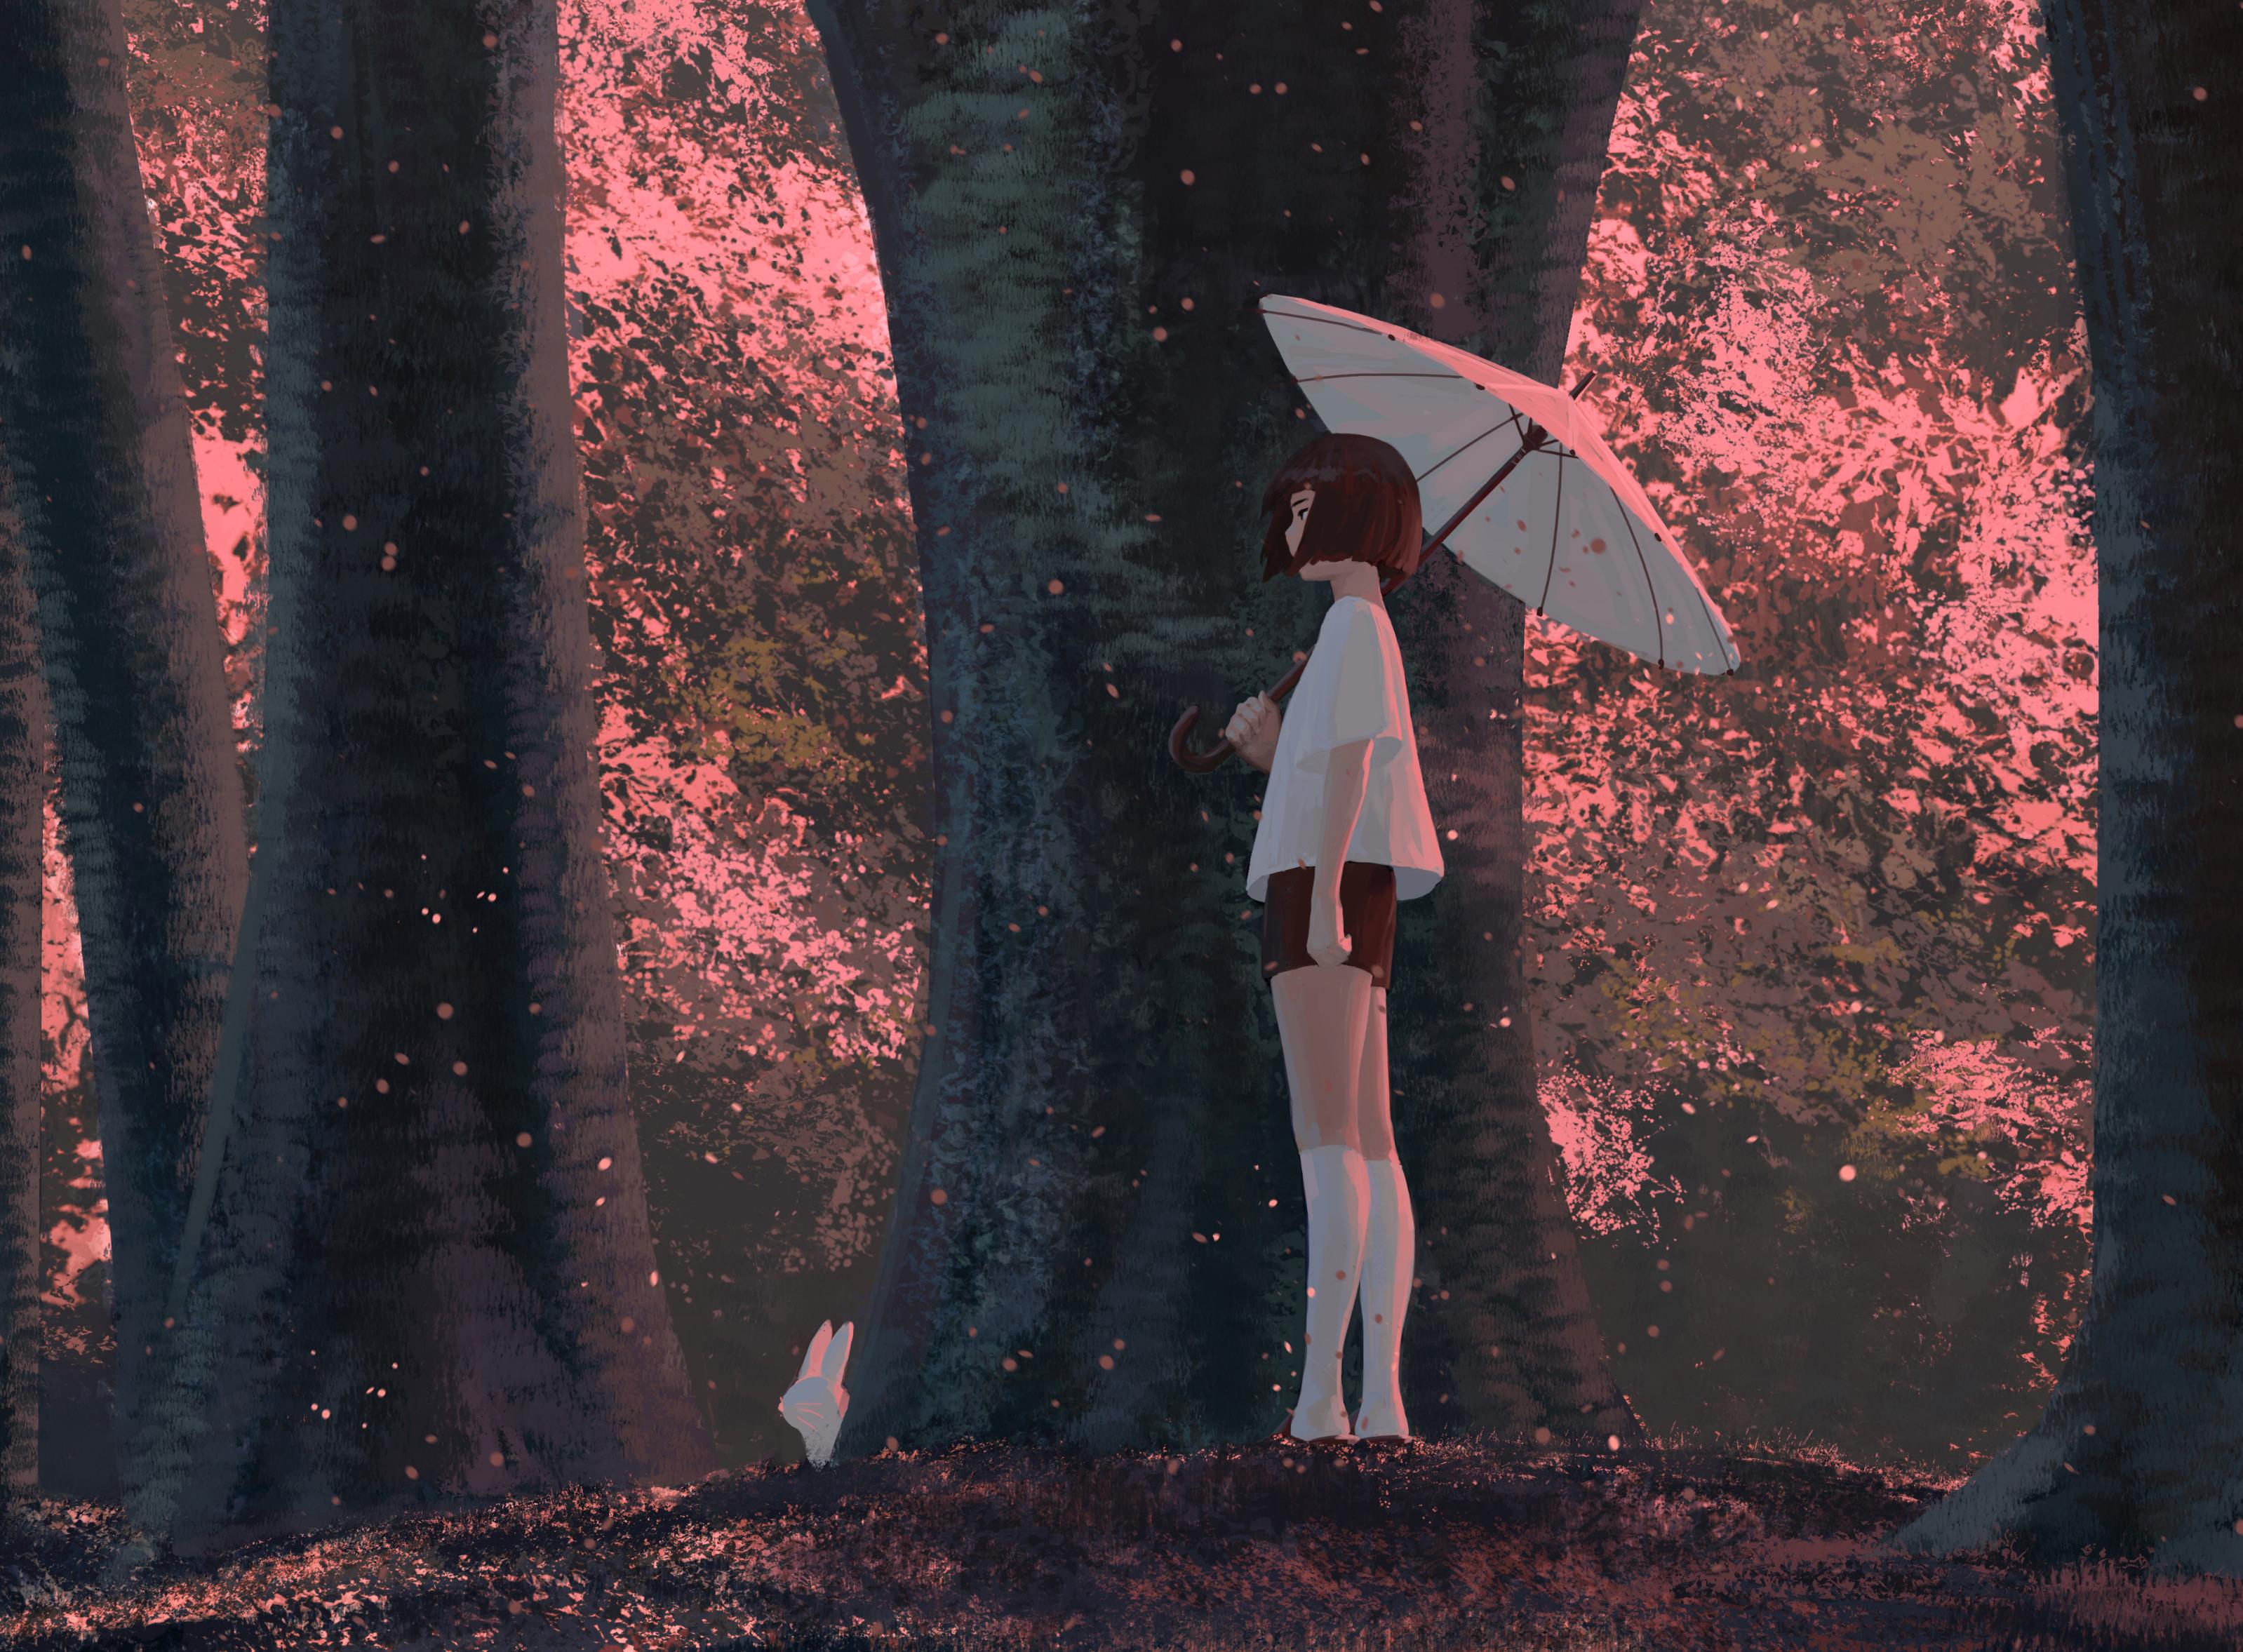 Anime 3197x2355 anime girls original characters anime women brunette short hair profile looking away umbrella forest trees rabbits T-shirt short shorts socks standing side view artwork drawing digital art illustration GUWEIZ Z.W. Gu